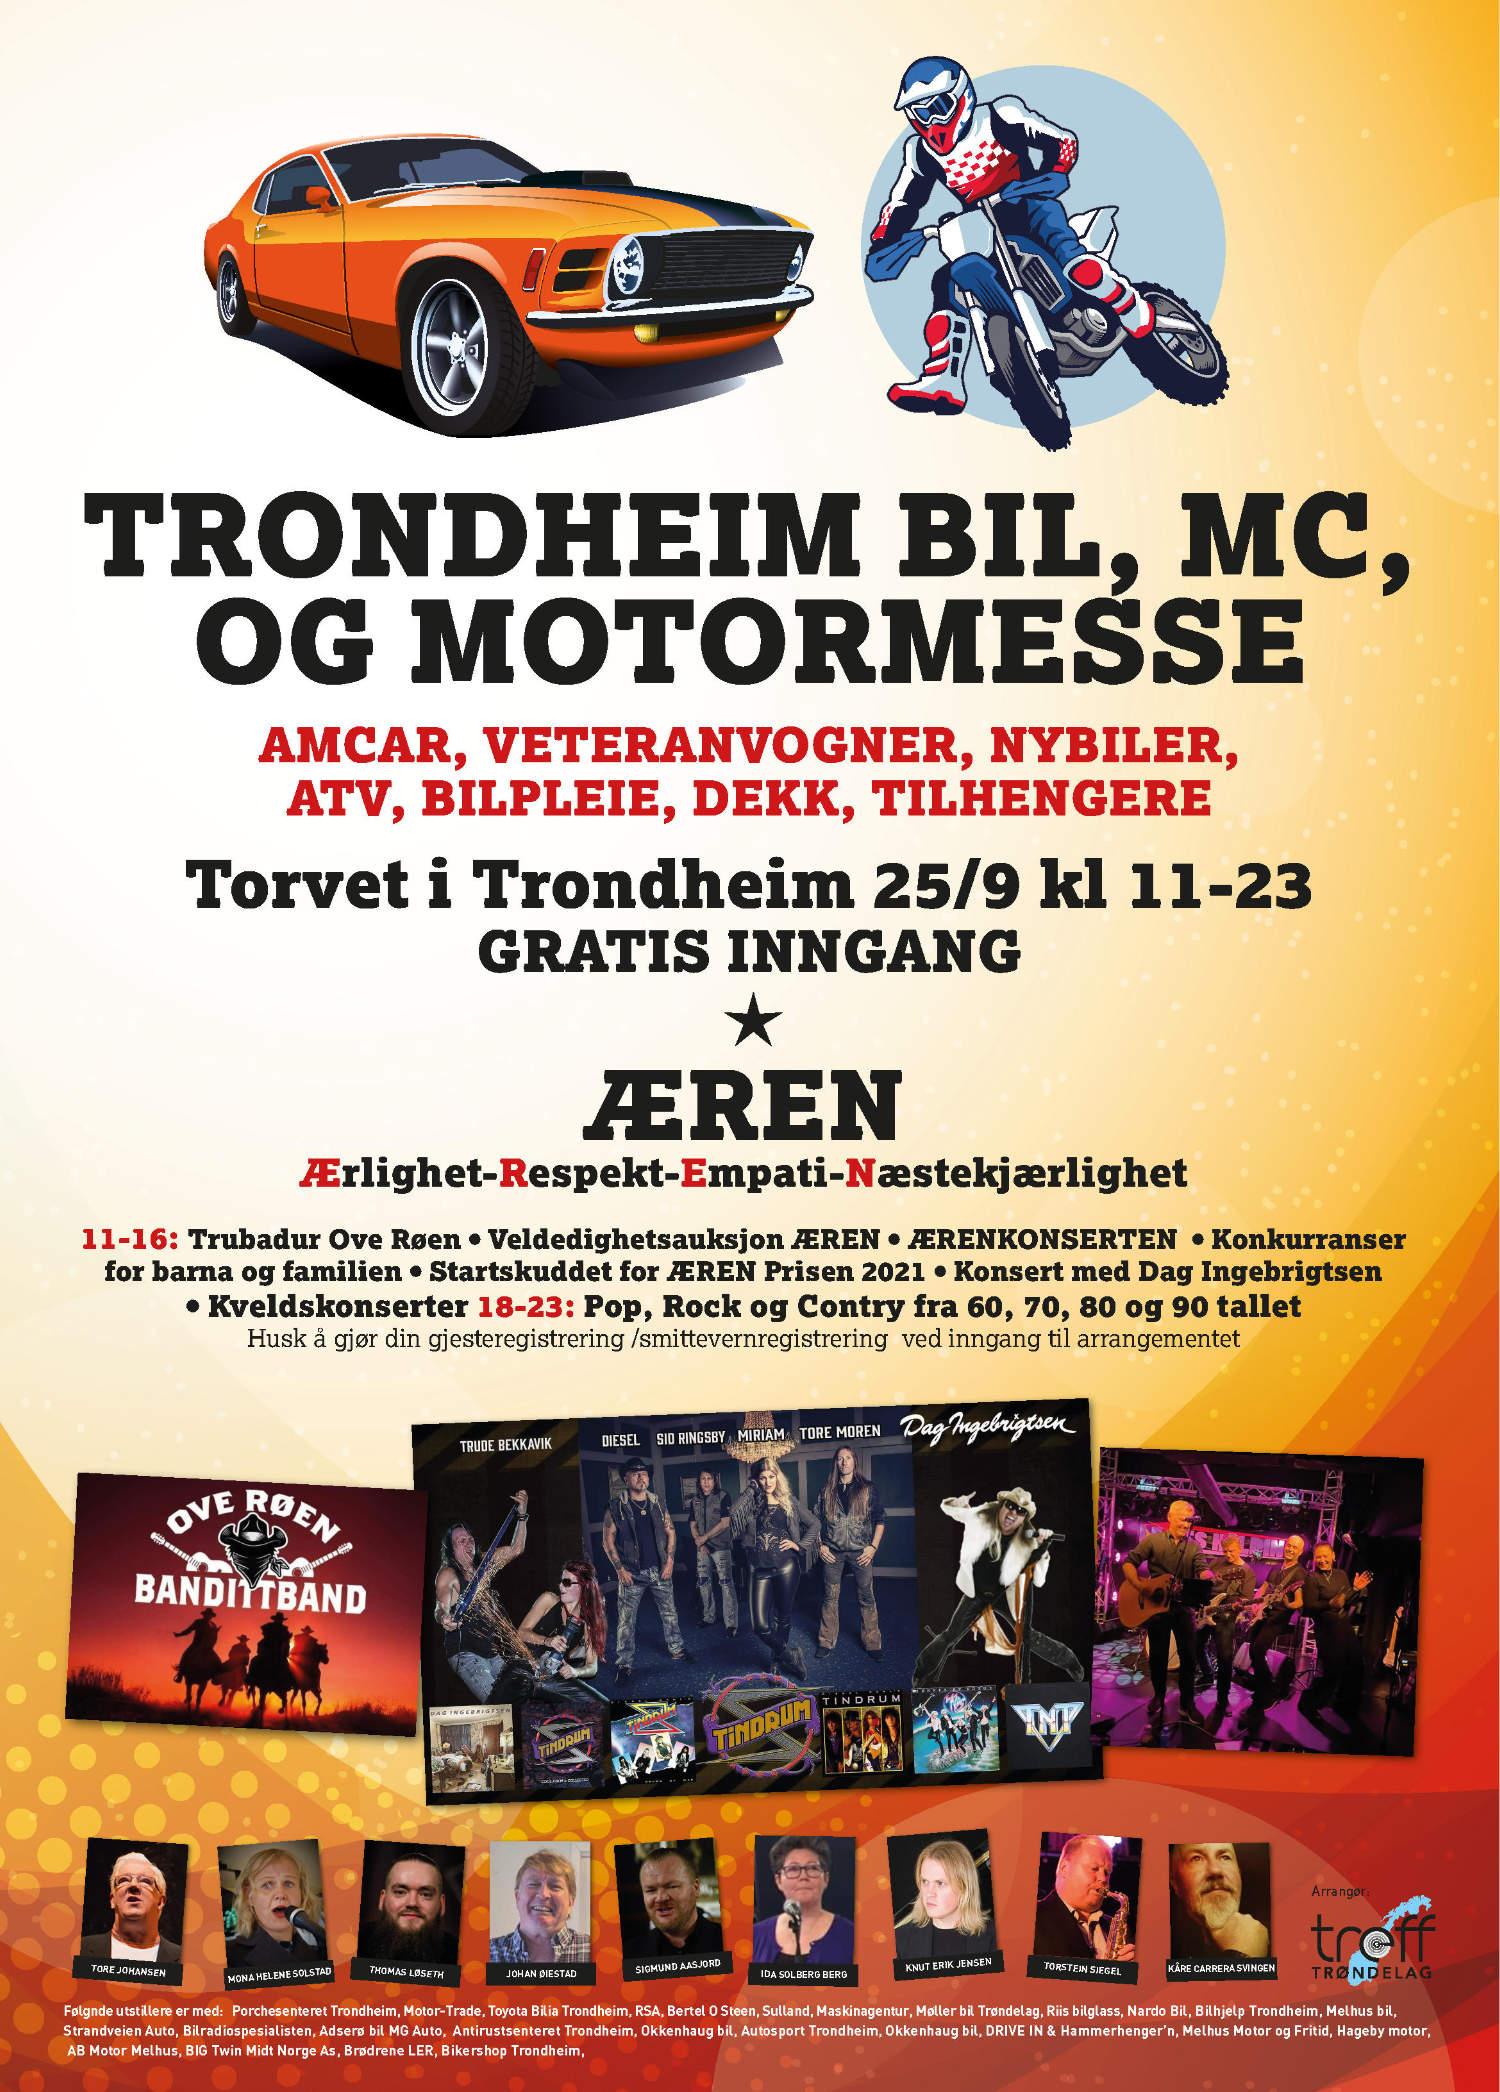 Trondheim Torg, på Trondheim Bil, MC og Motormesse